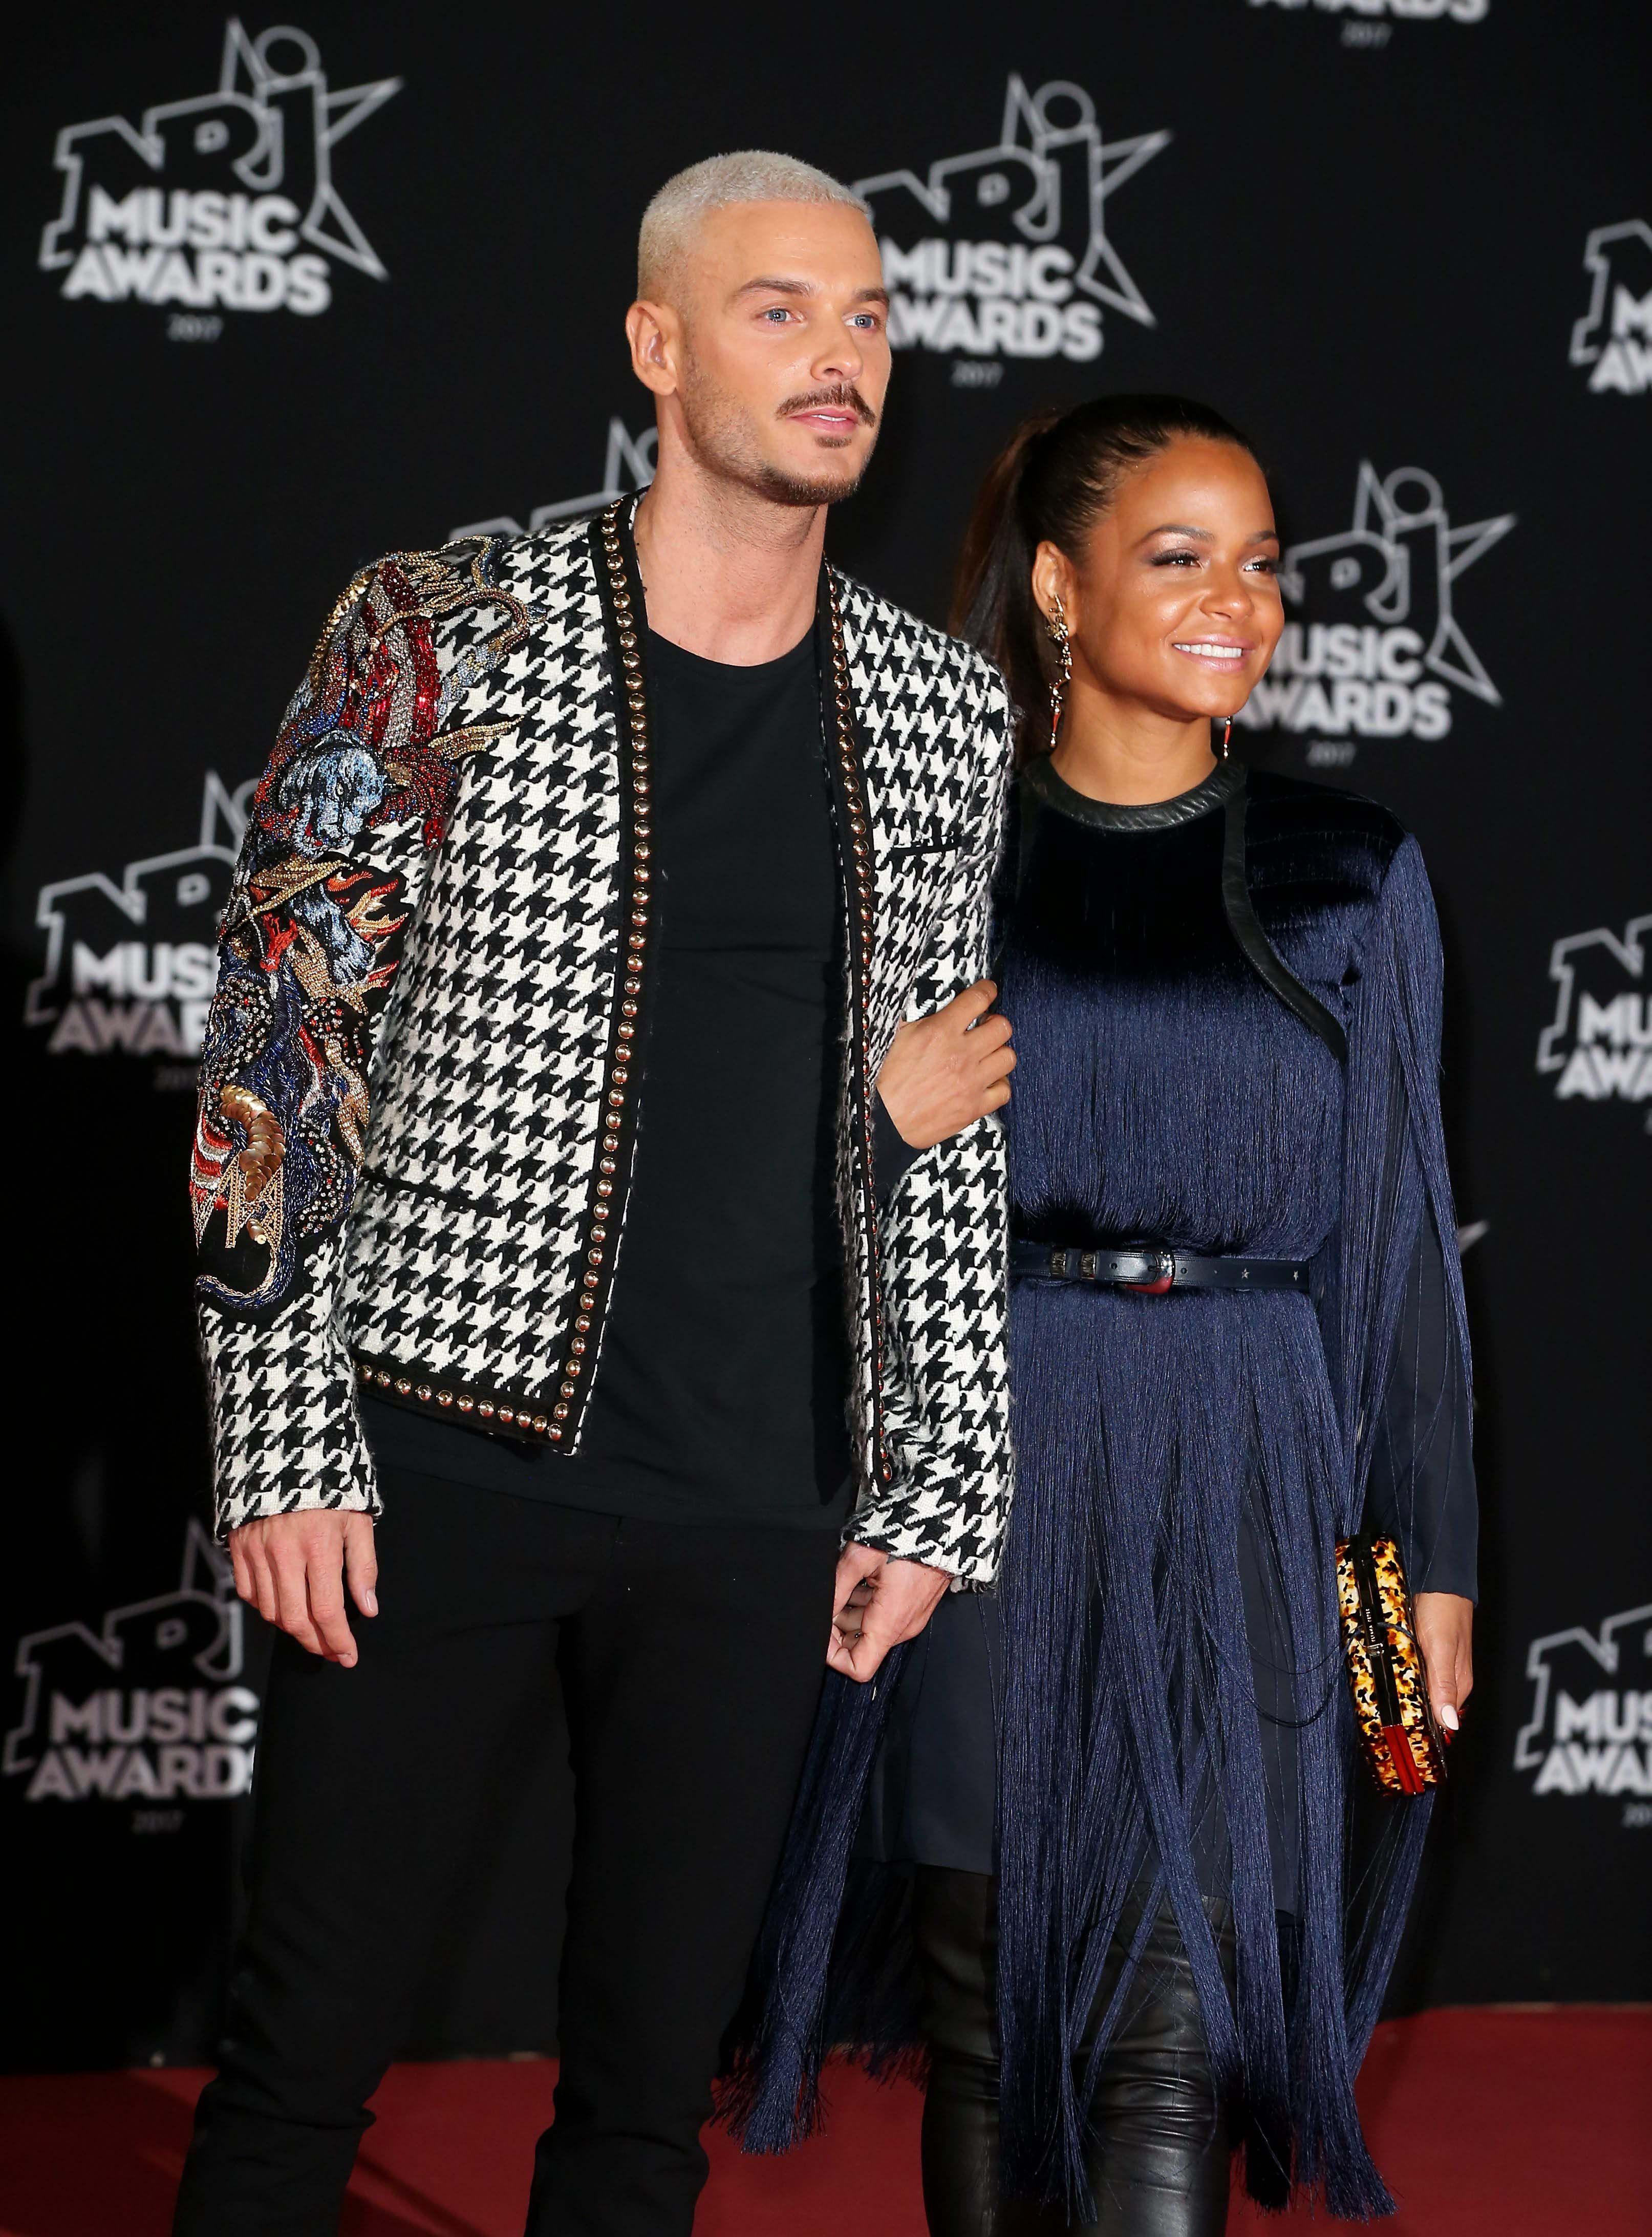 NRJ Music Awards 2017 : Matt Pokora et Christina Milian amoureux sur le tapis rouge !